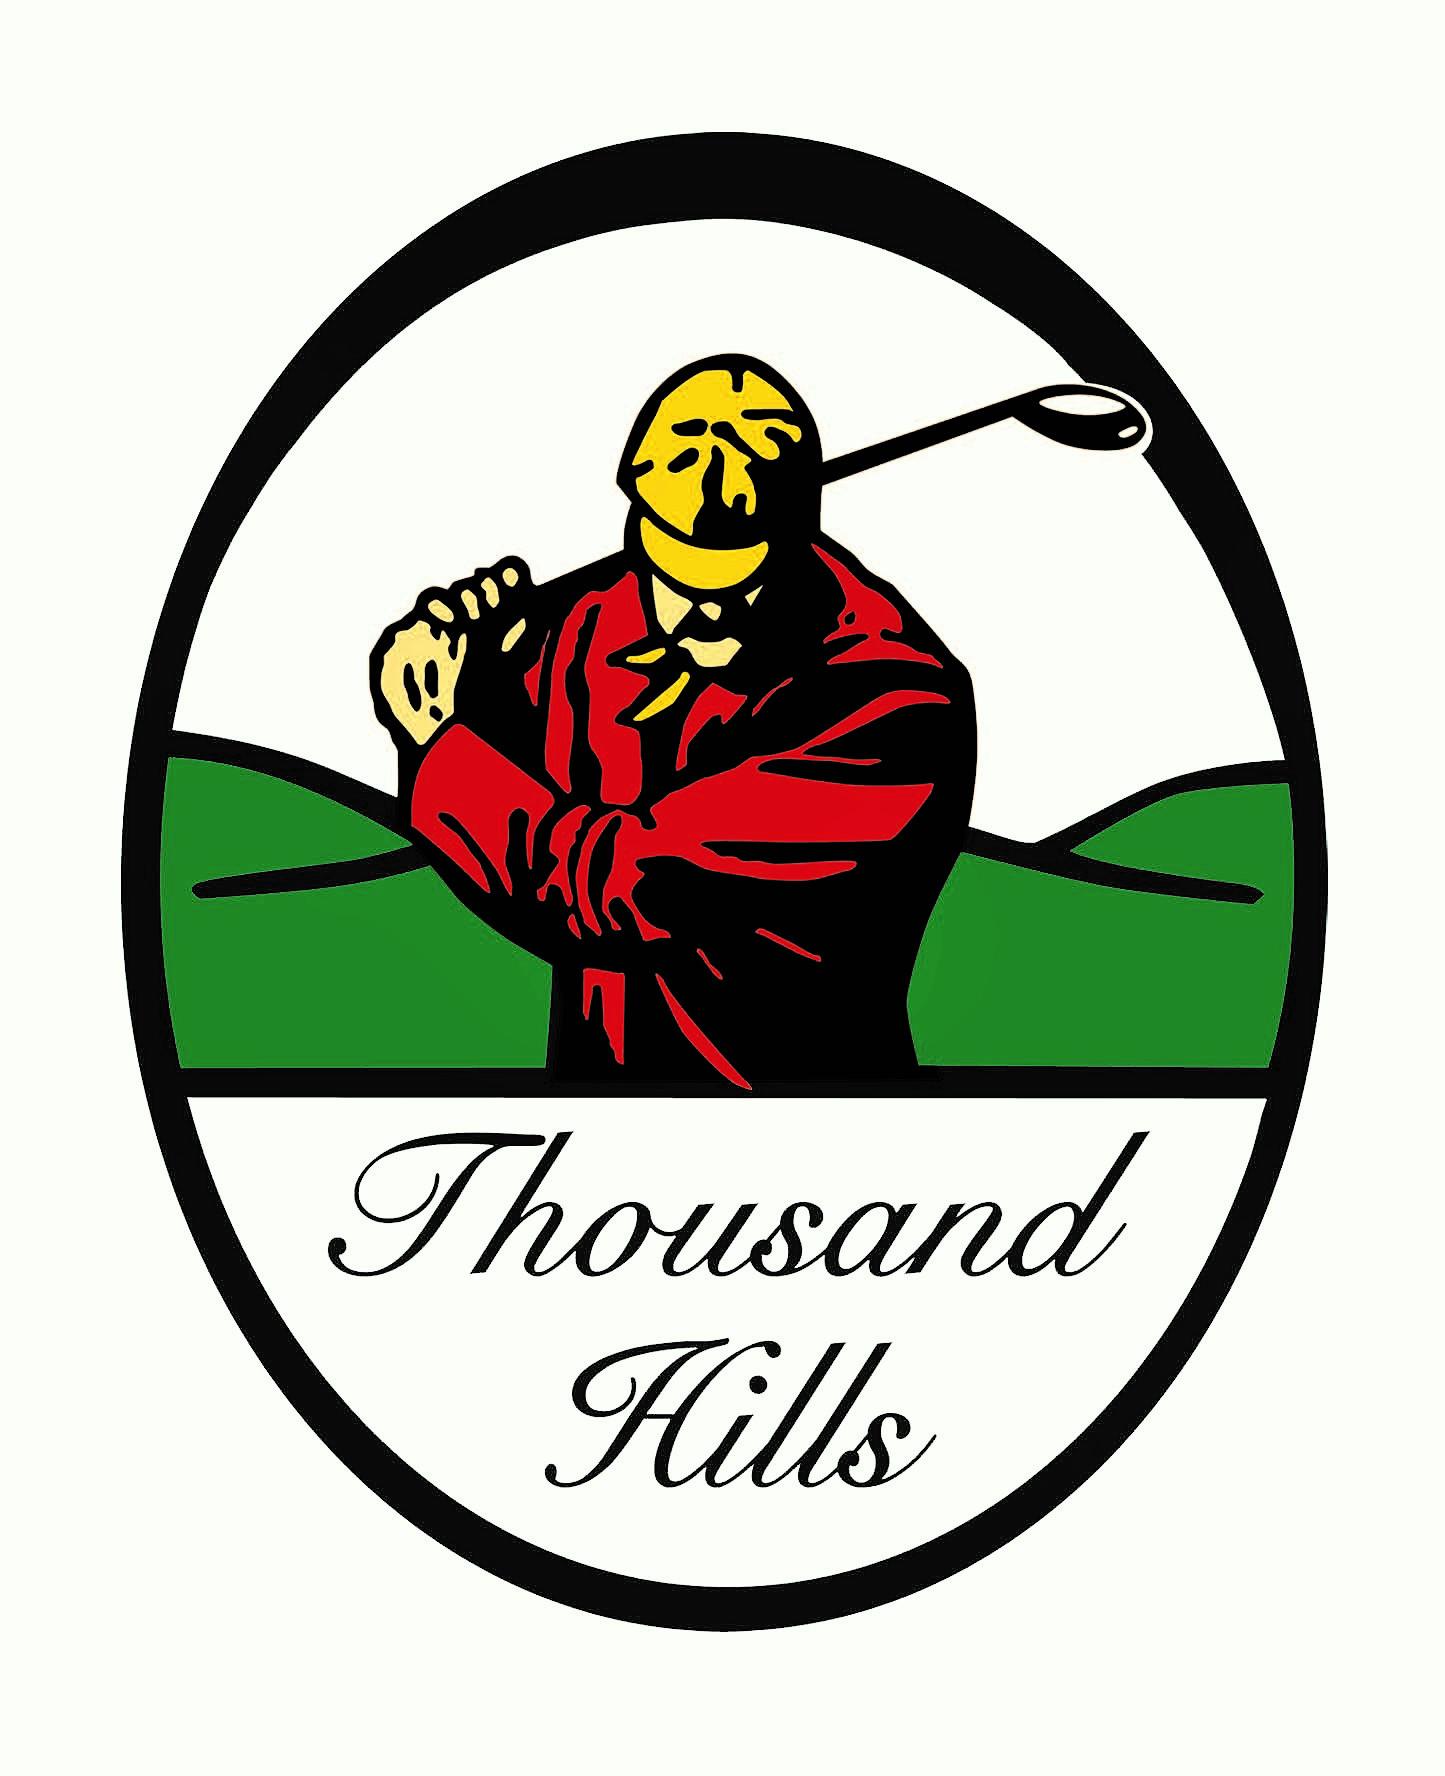 Branson Cabins - Condos, Hotel Lodging, Golf Resort - Thousand Hills